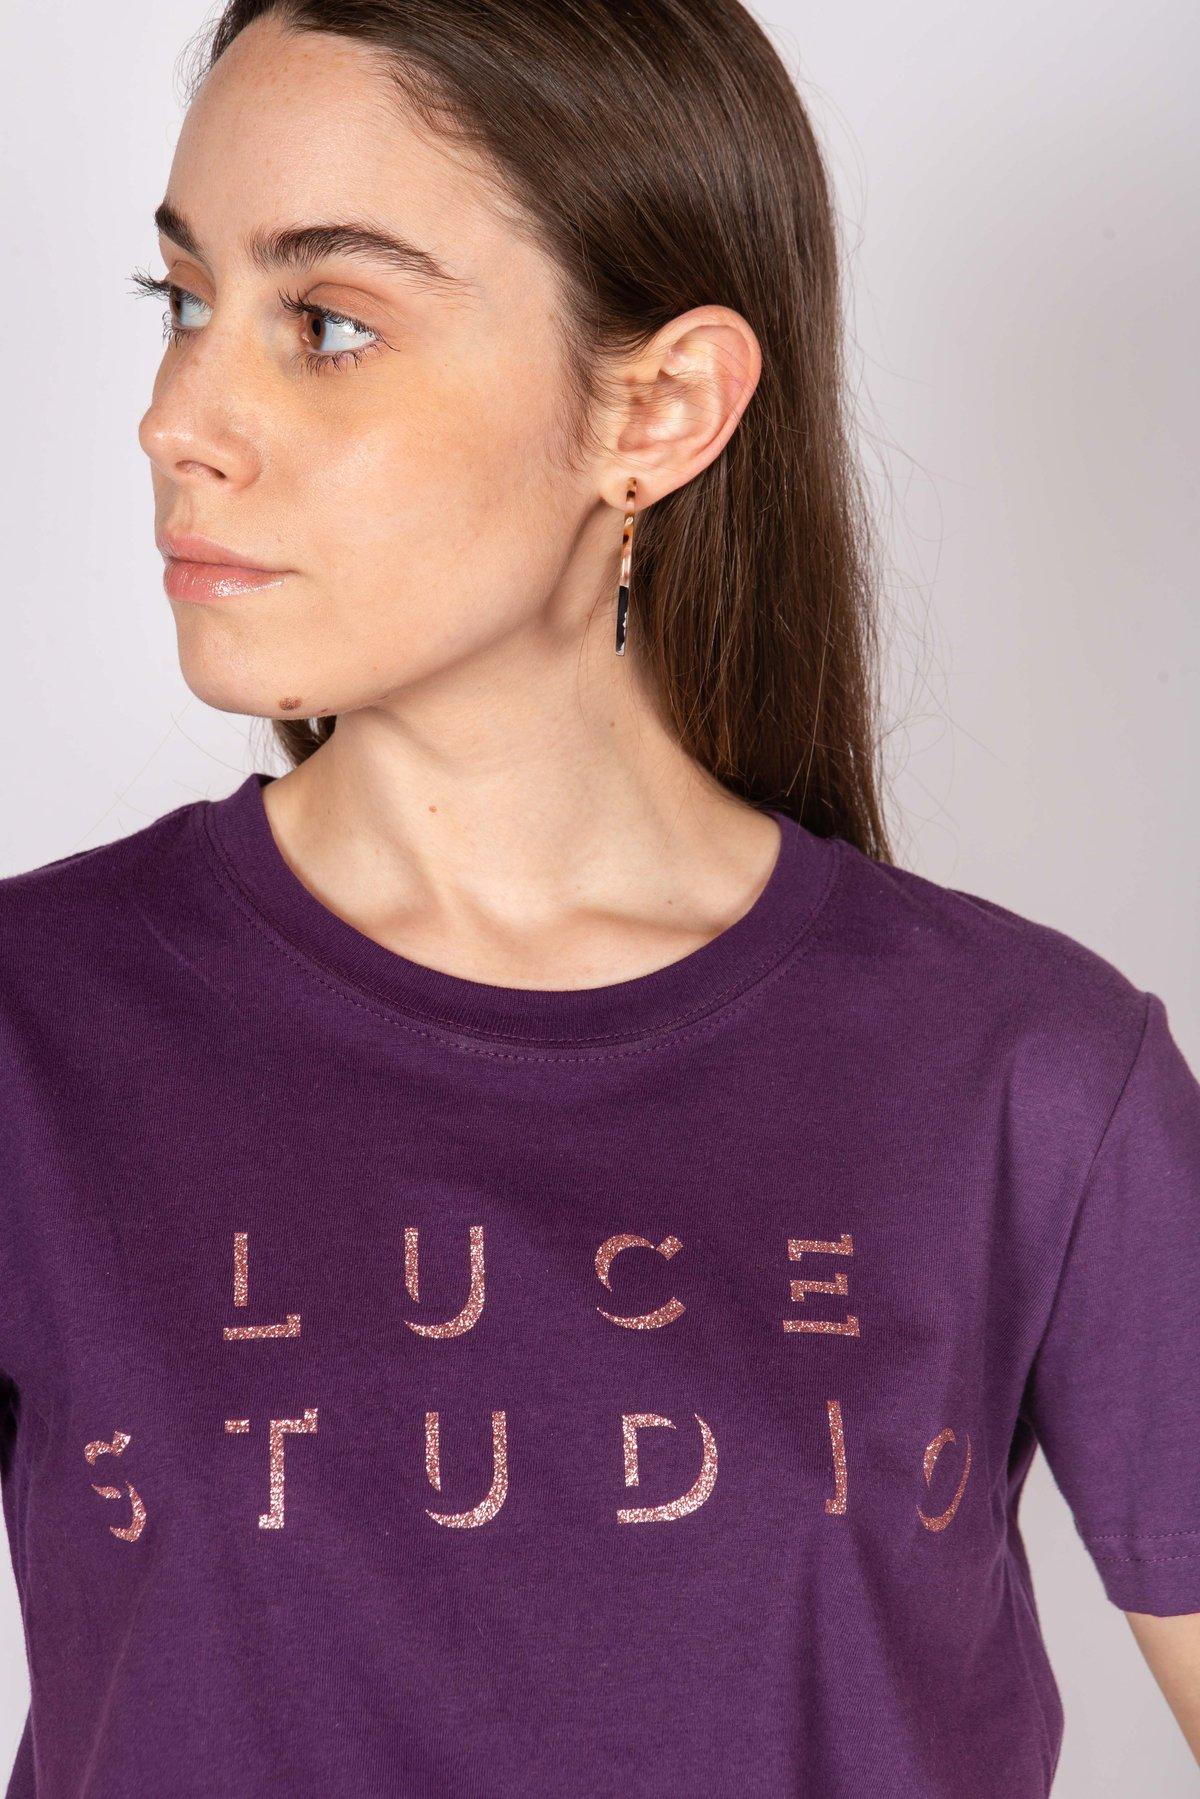 Image of T-SHIRT LUCE STUDIO VIOLA €69 - 50%